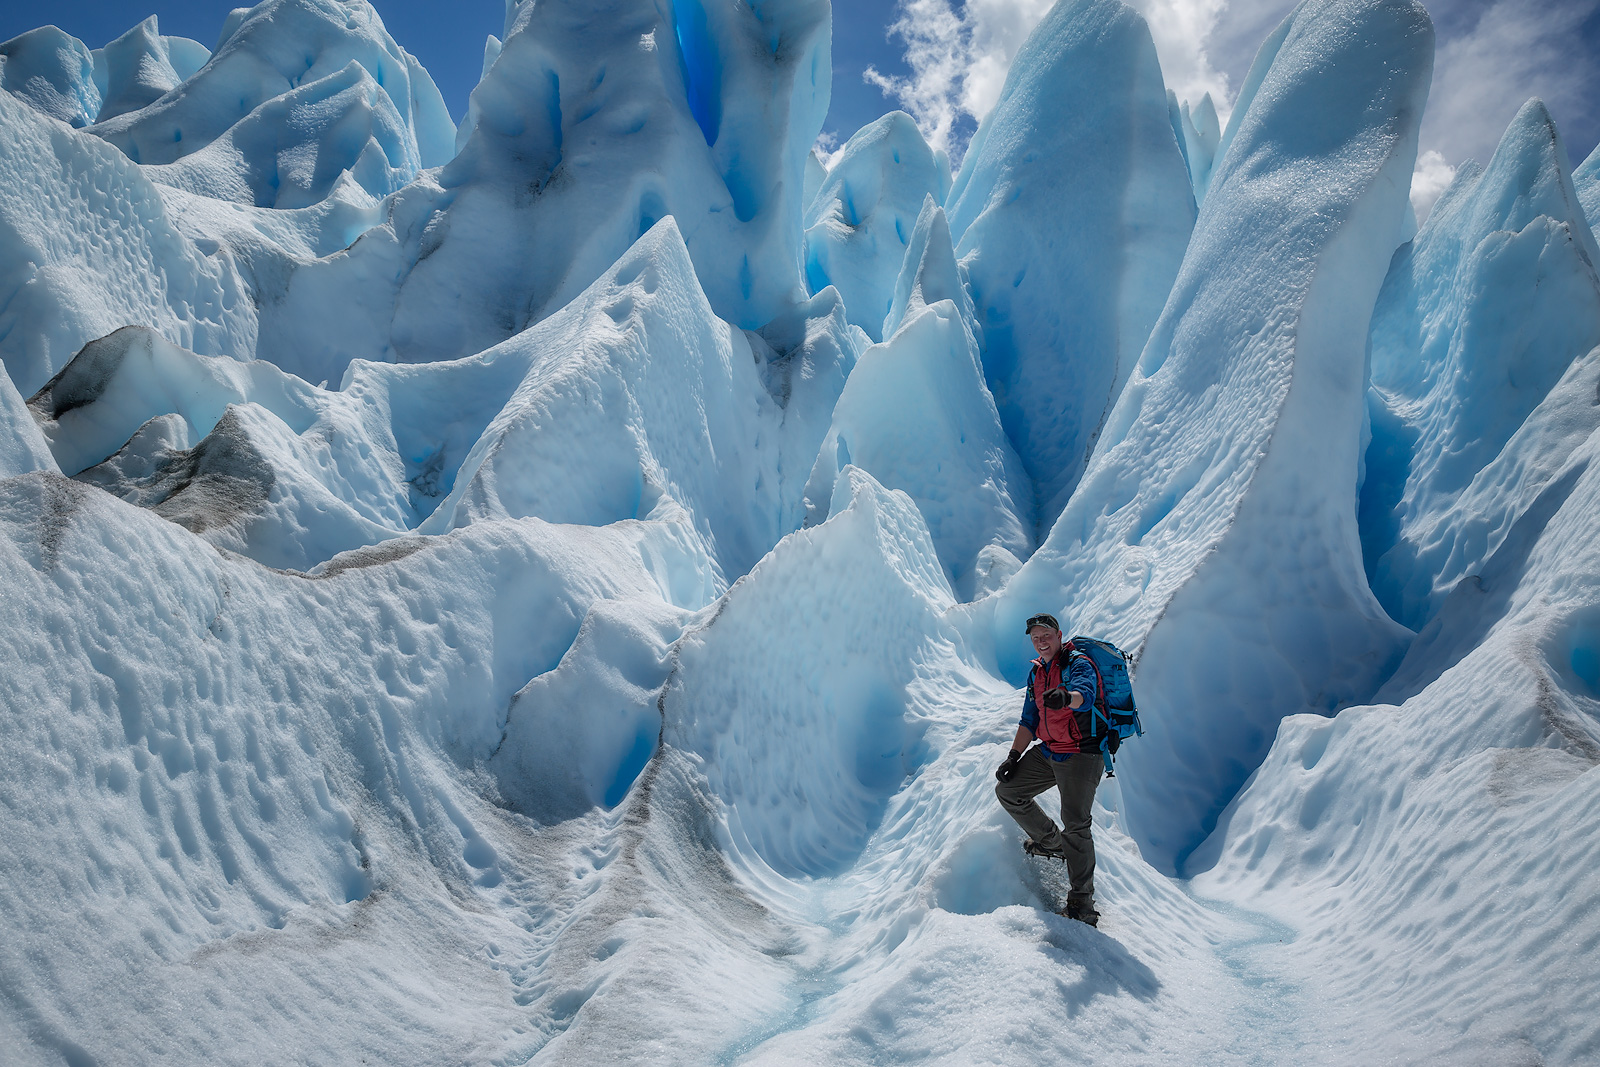 Spring, afternoon, andes mountains, argentina, beautiful, blue, glacier, hiking, ice, landscape, los glaciares national park, patagonia, perito moreno glacier, snow, south america, photo